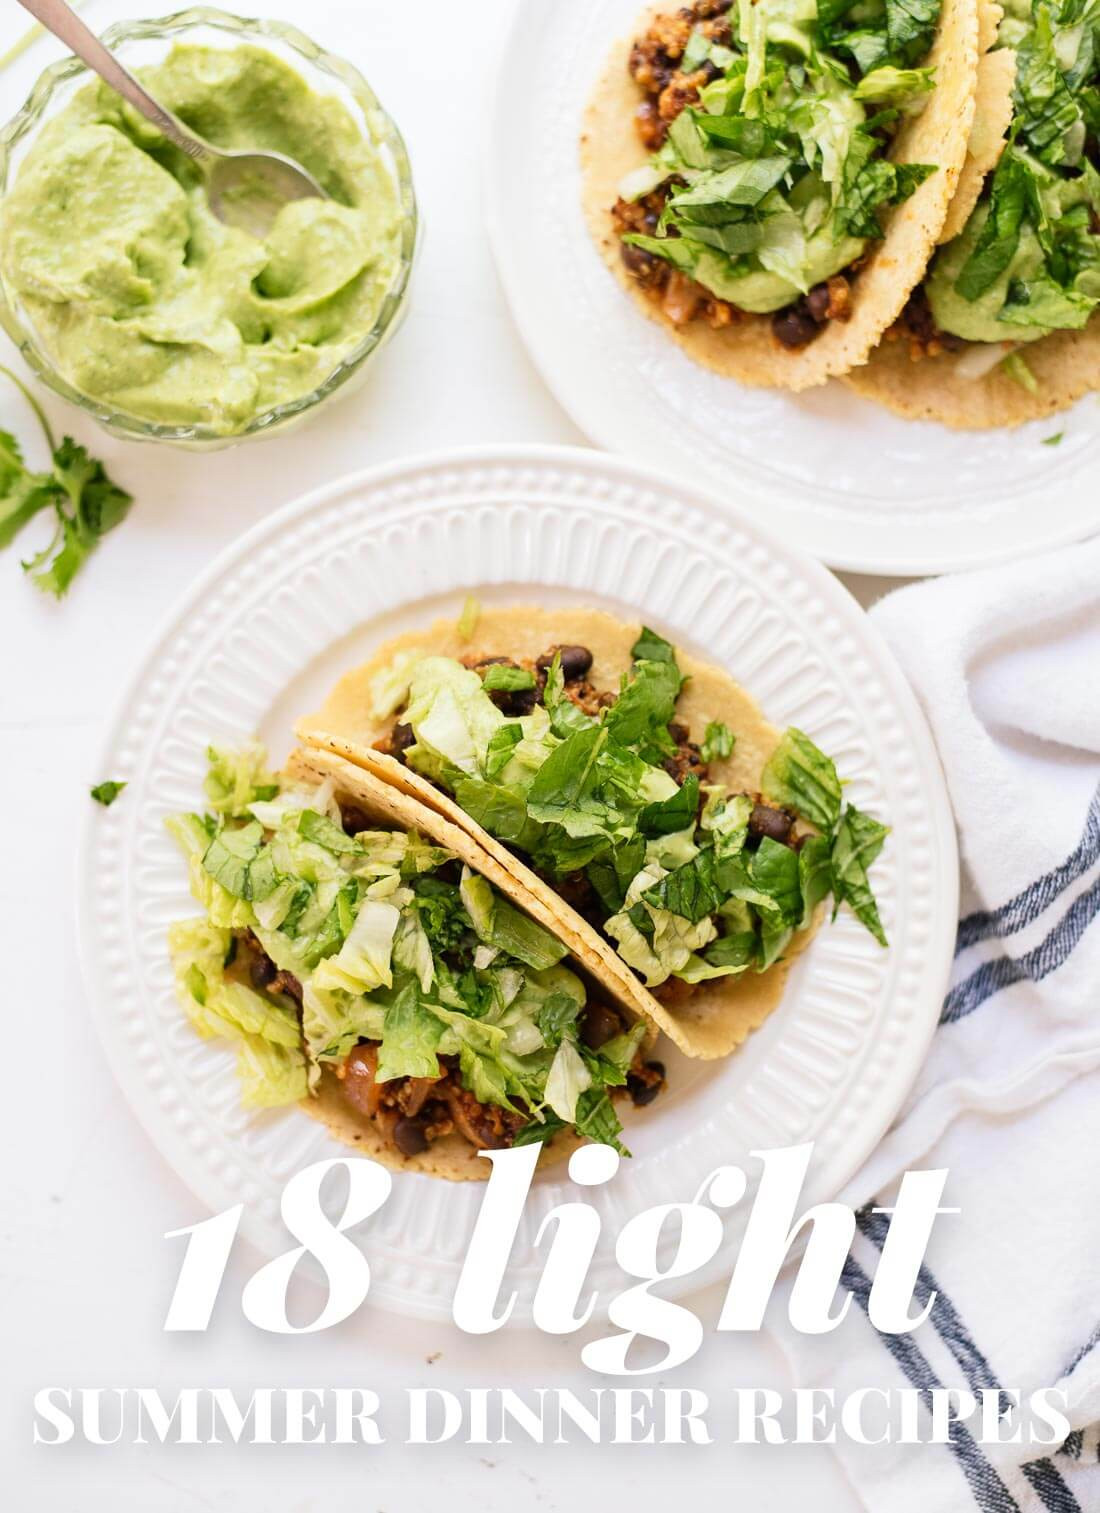 Light Dinner Ideas For Summer  18 Light Summer Dinner Recipes Cookie and Kate